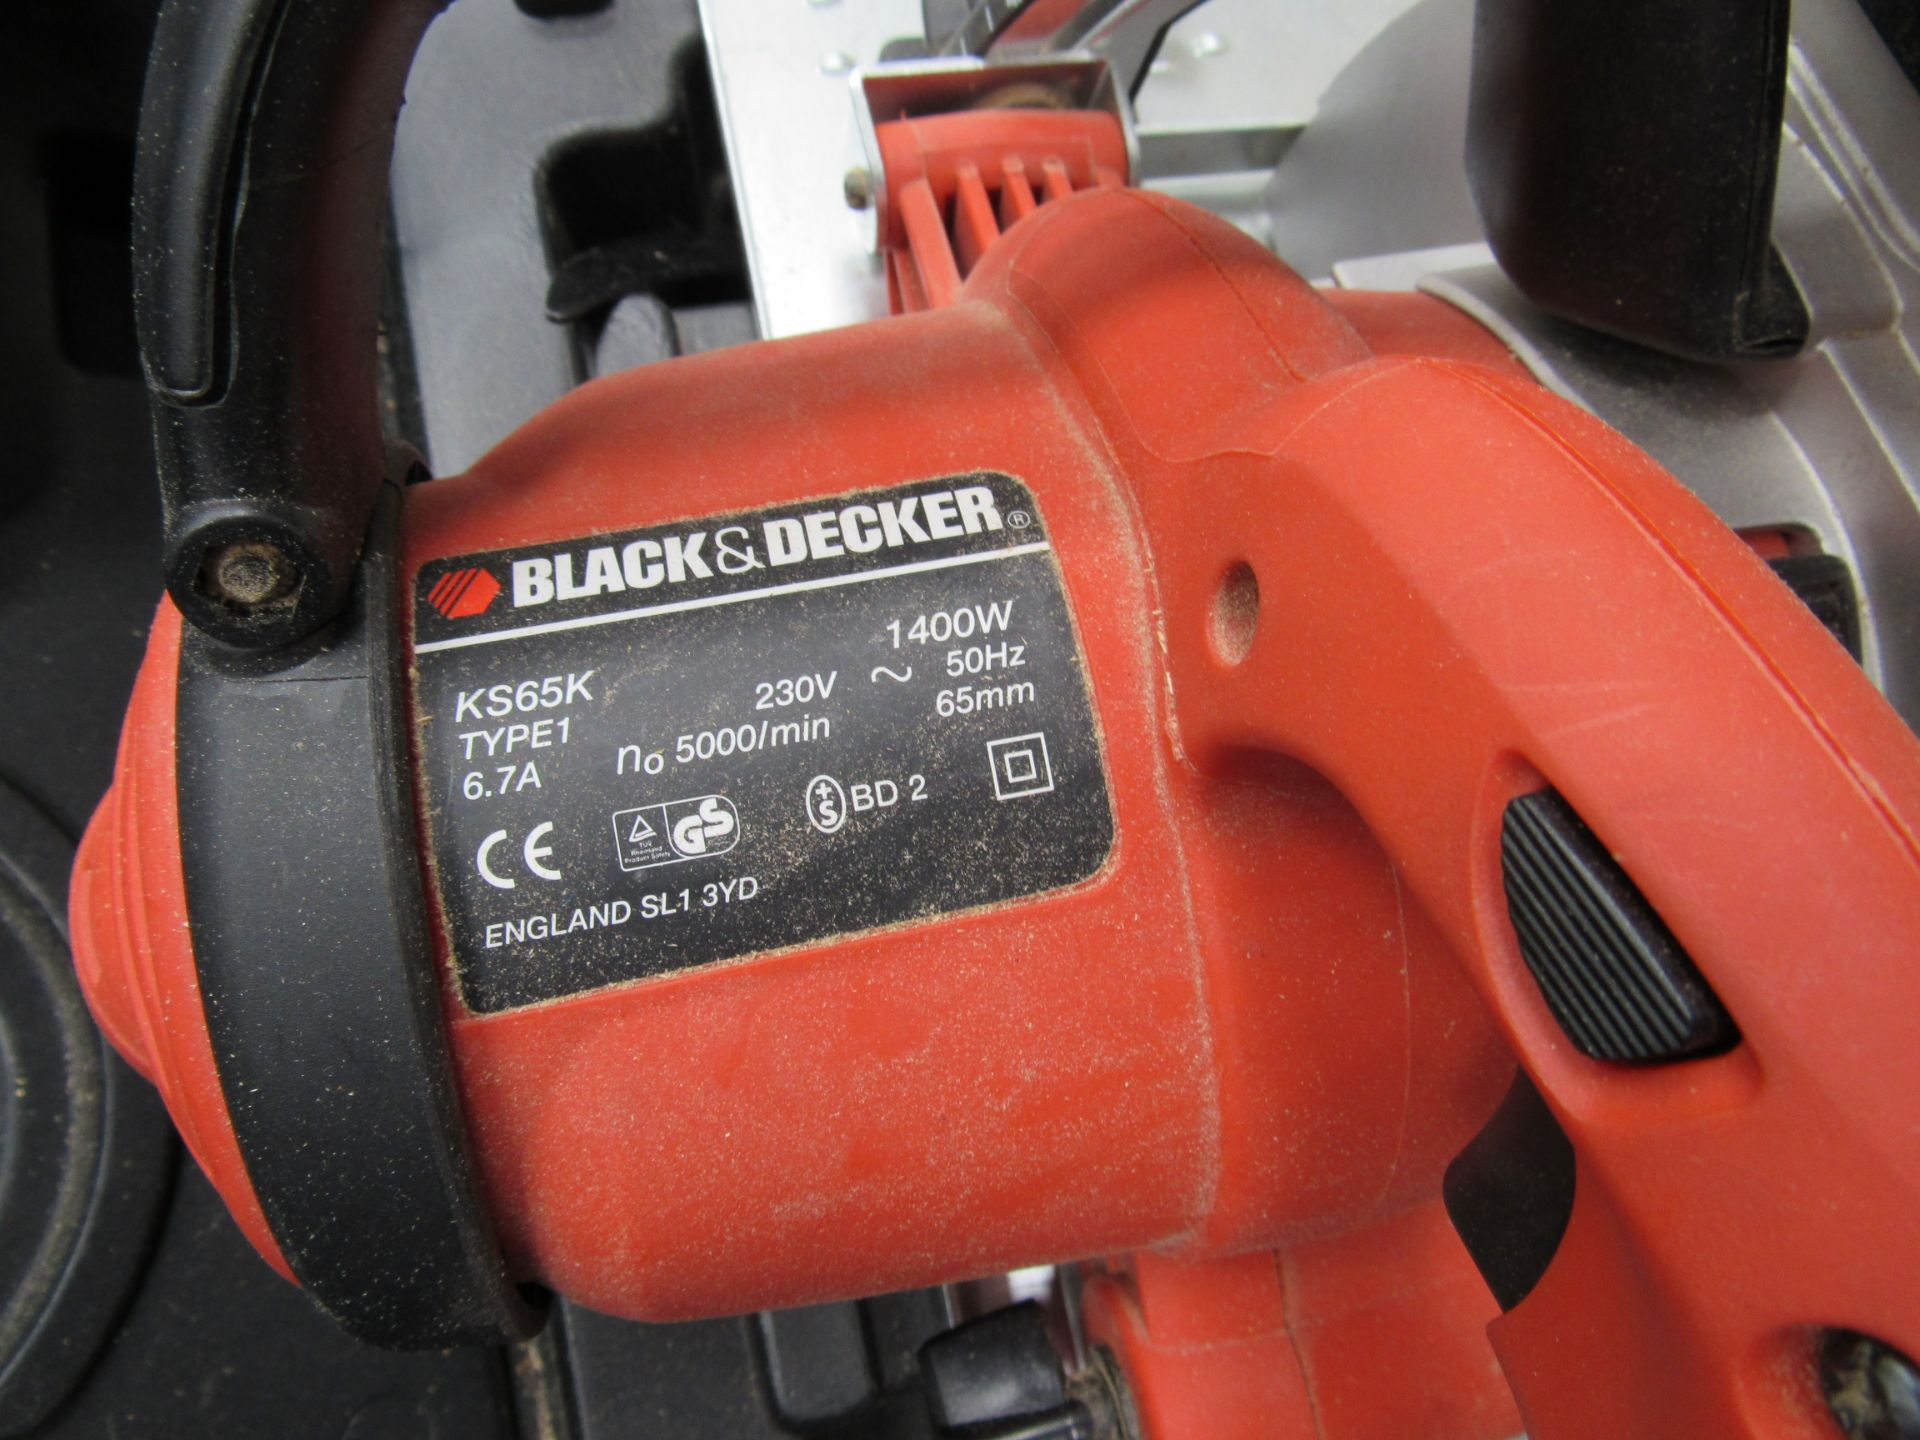 Black and Decker KS65K 1400w - Image 3 of 3